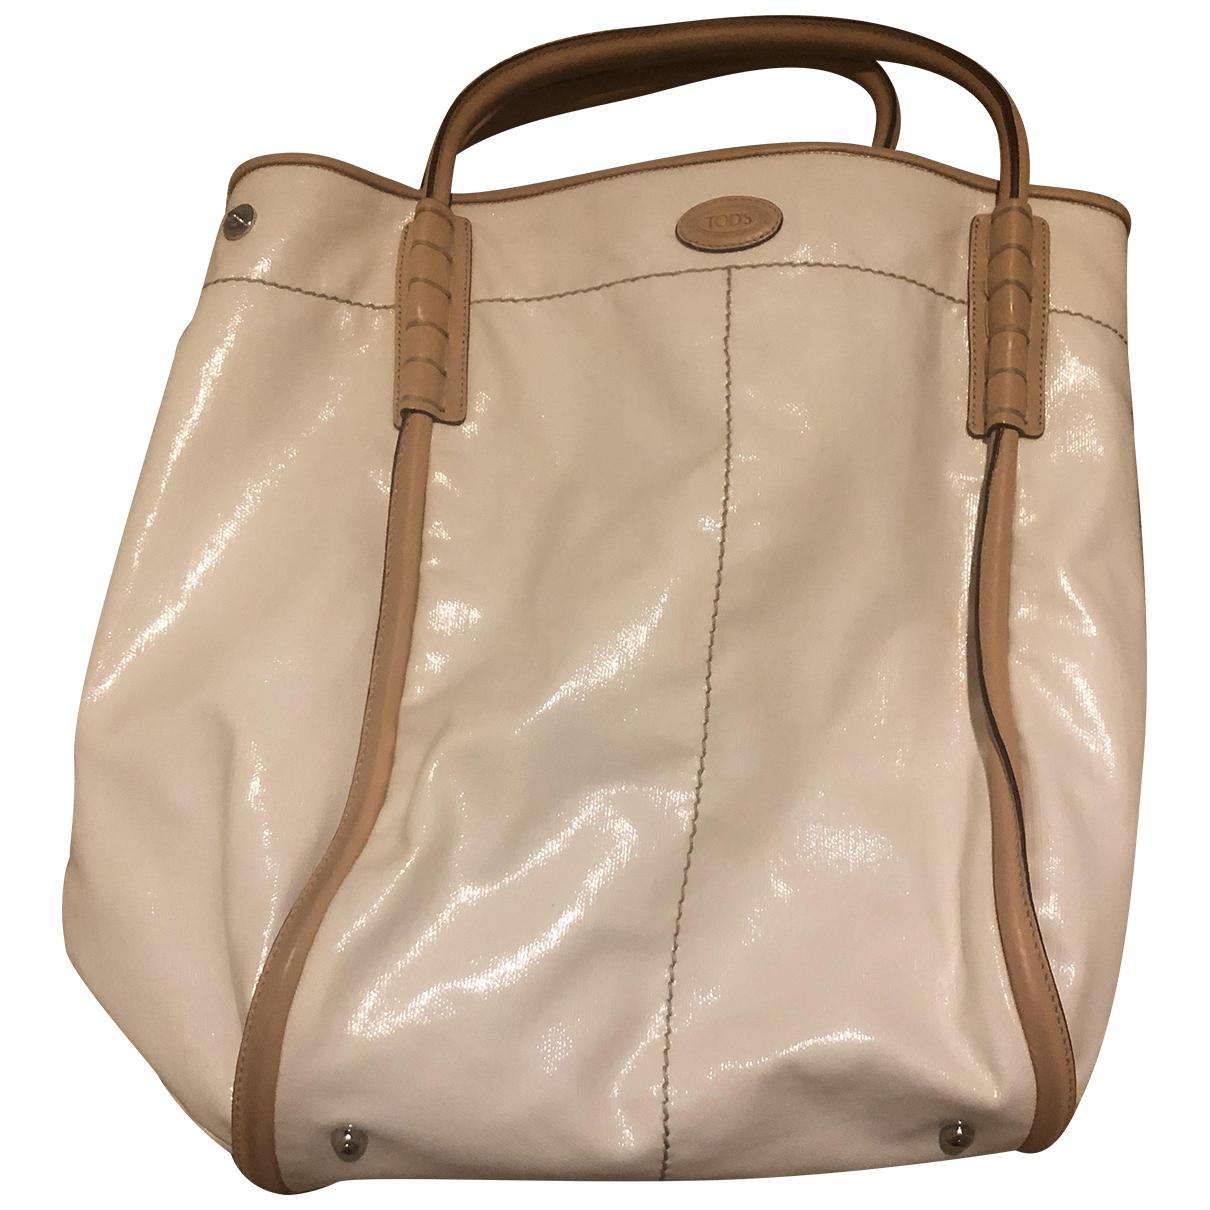 Tod's \N White Patent leather handbag for Women \N